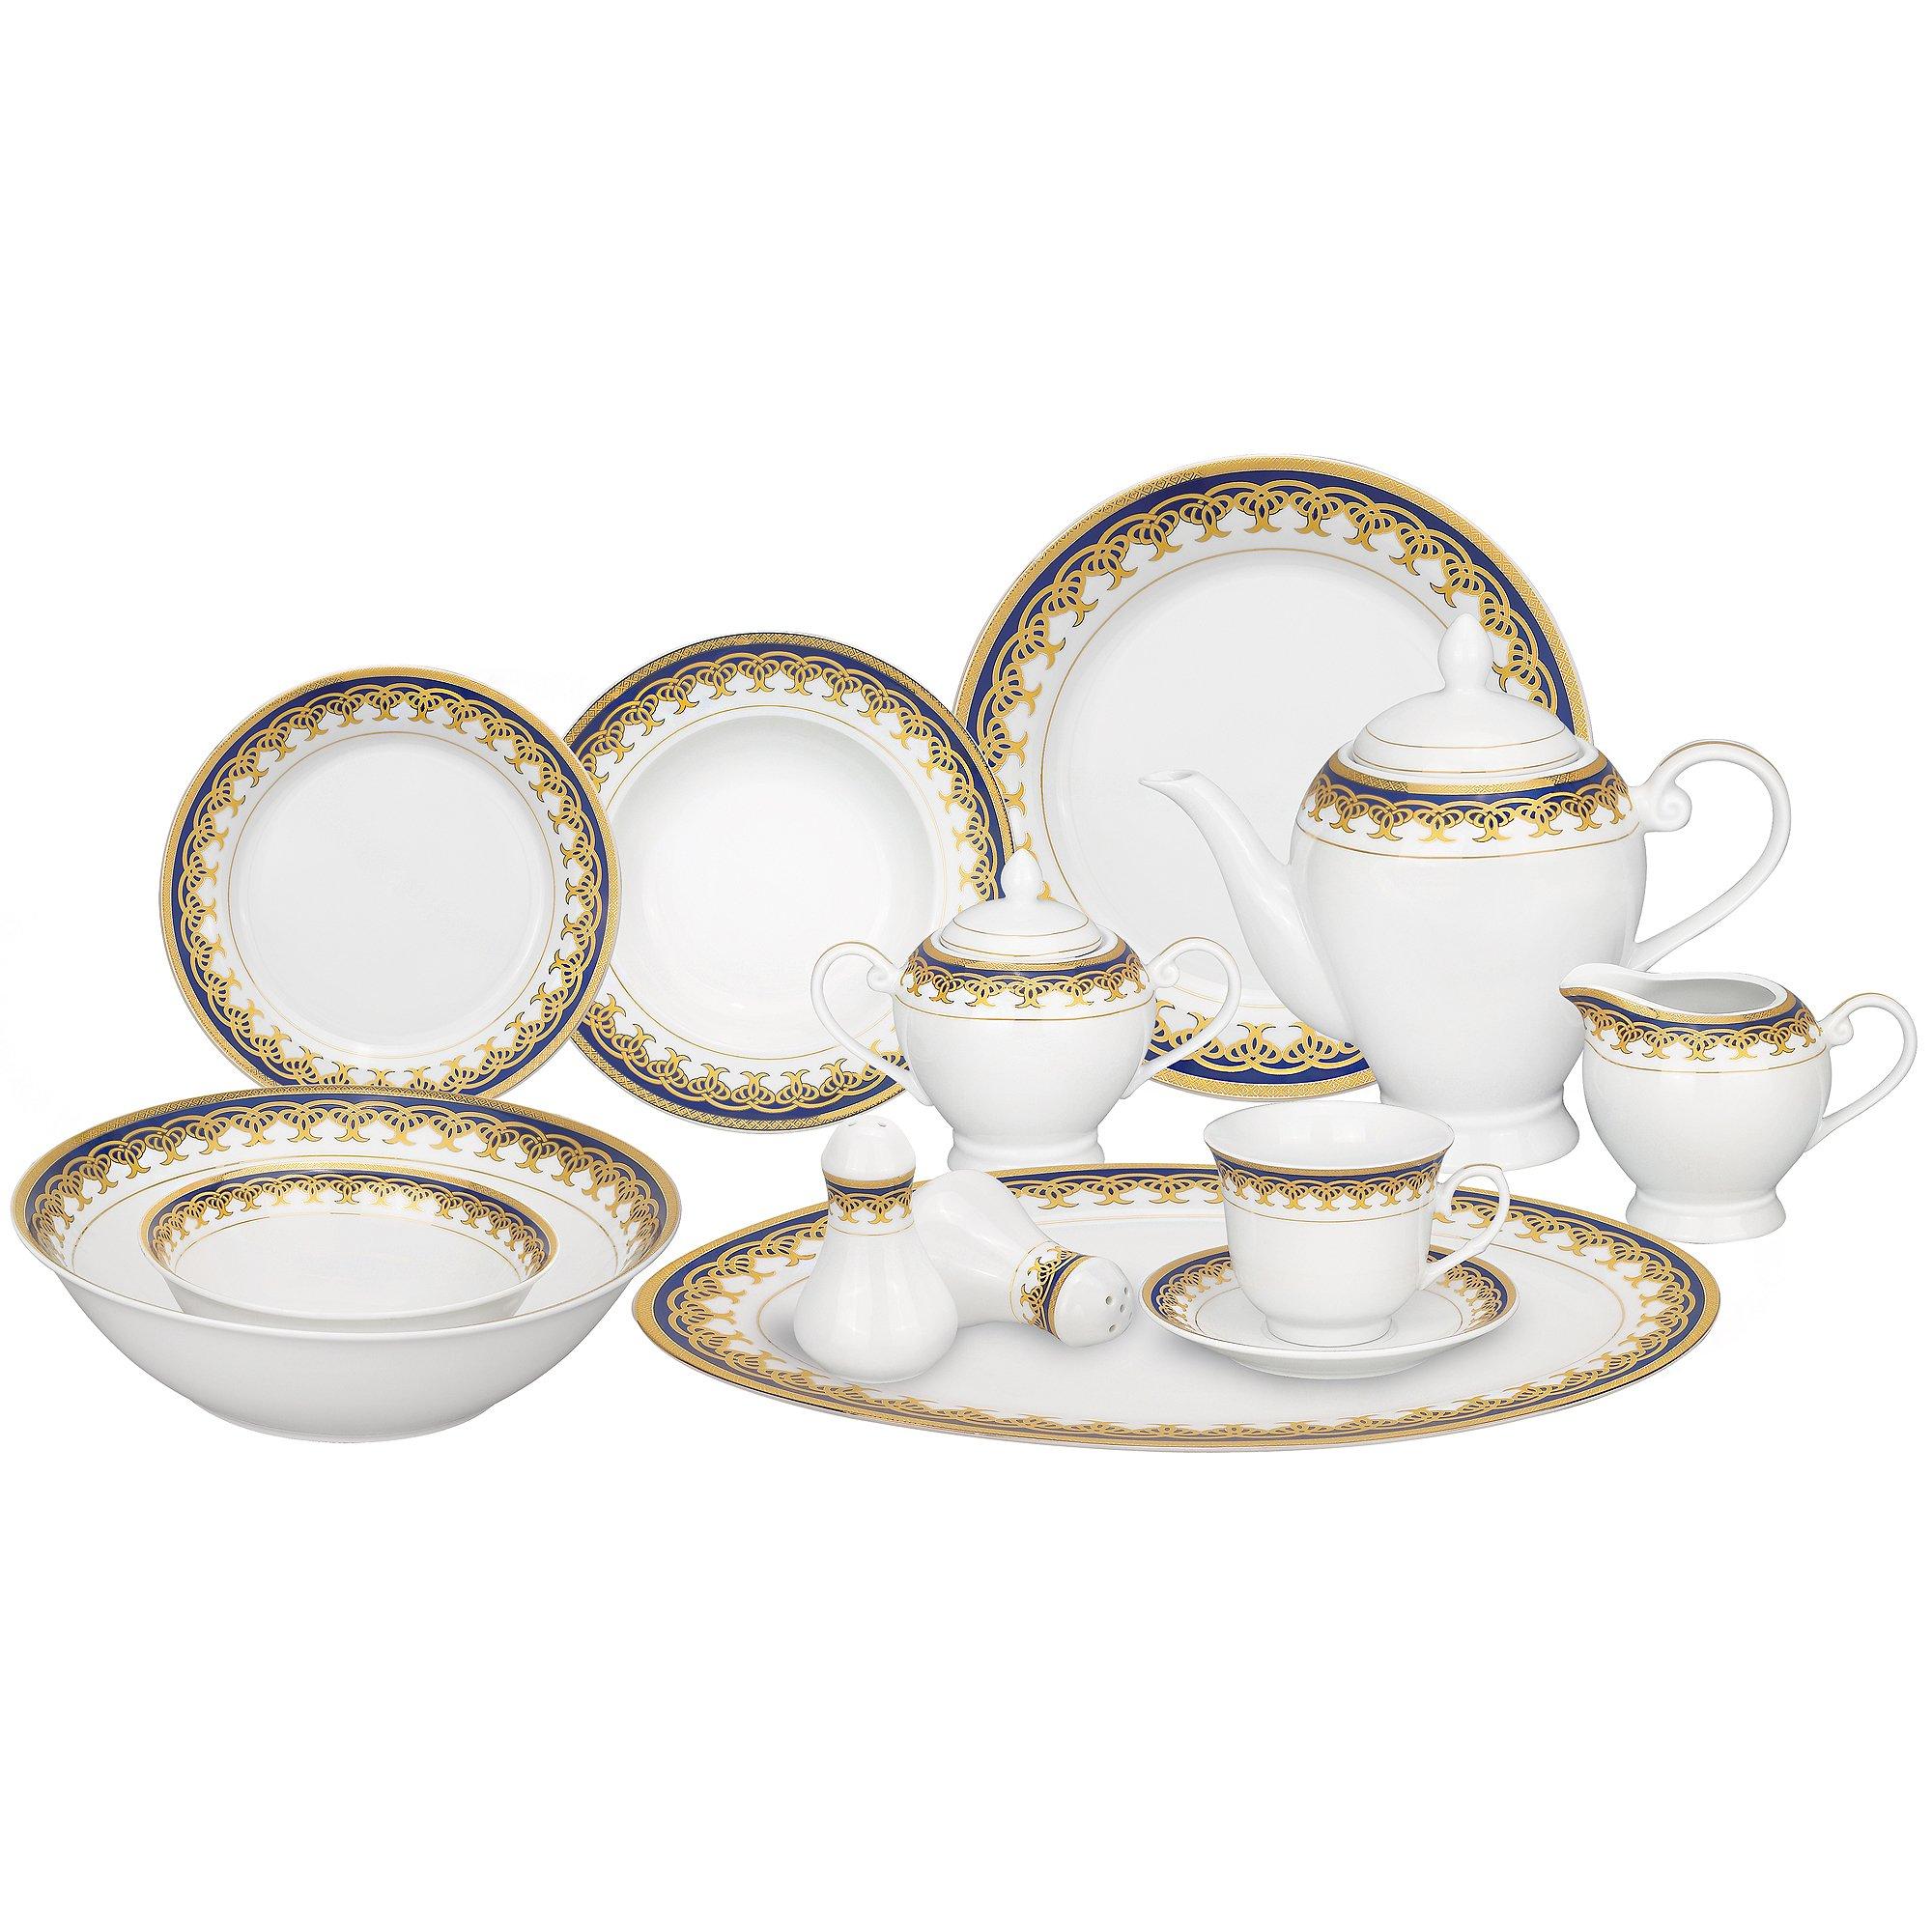 Lorren Home Trends 57-Piece Porcelain Dinnerware Set, Iris, Service for 8